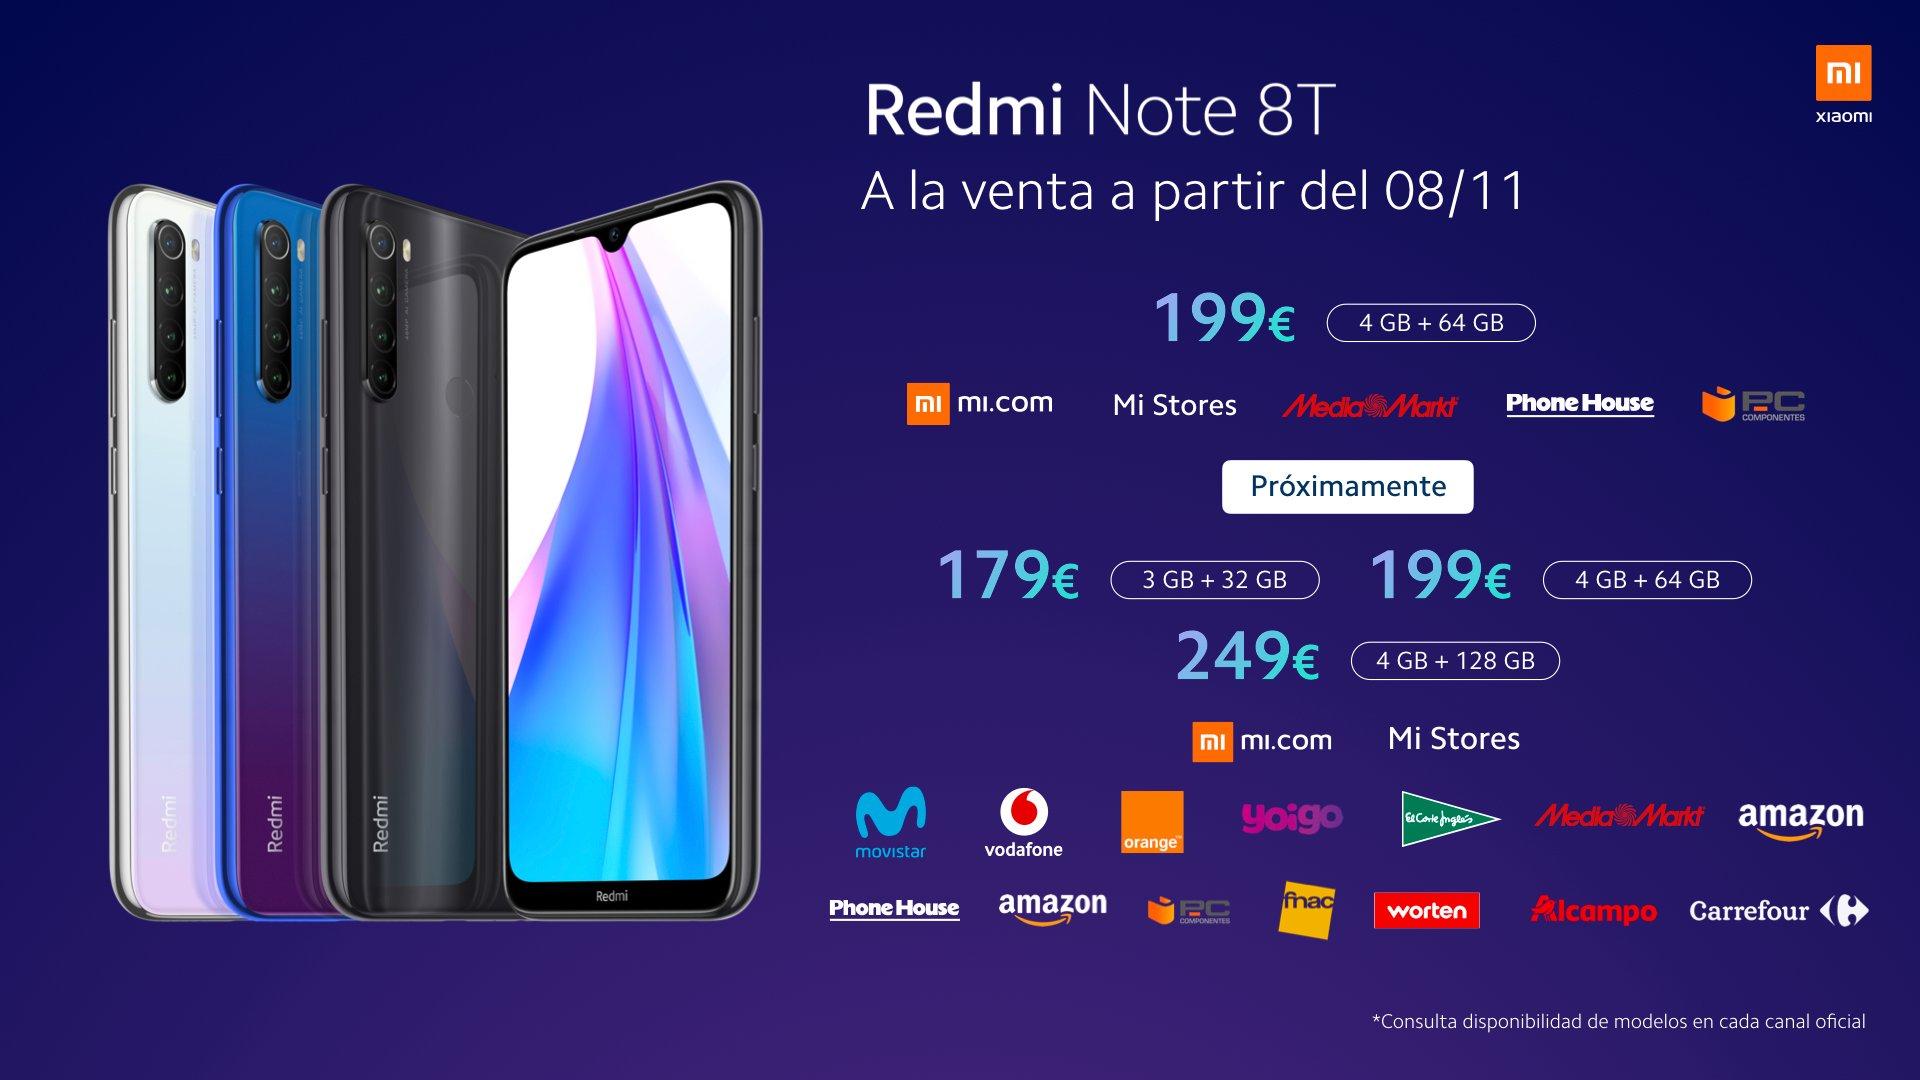 Цена Redmi Note 8T